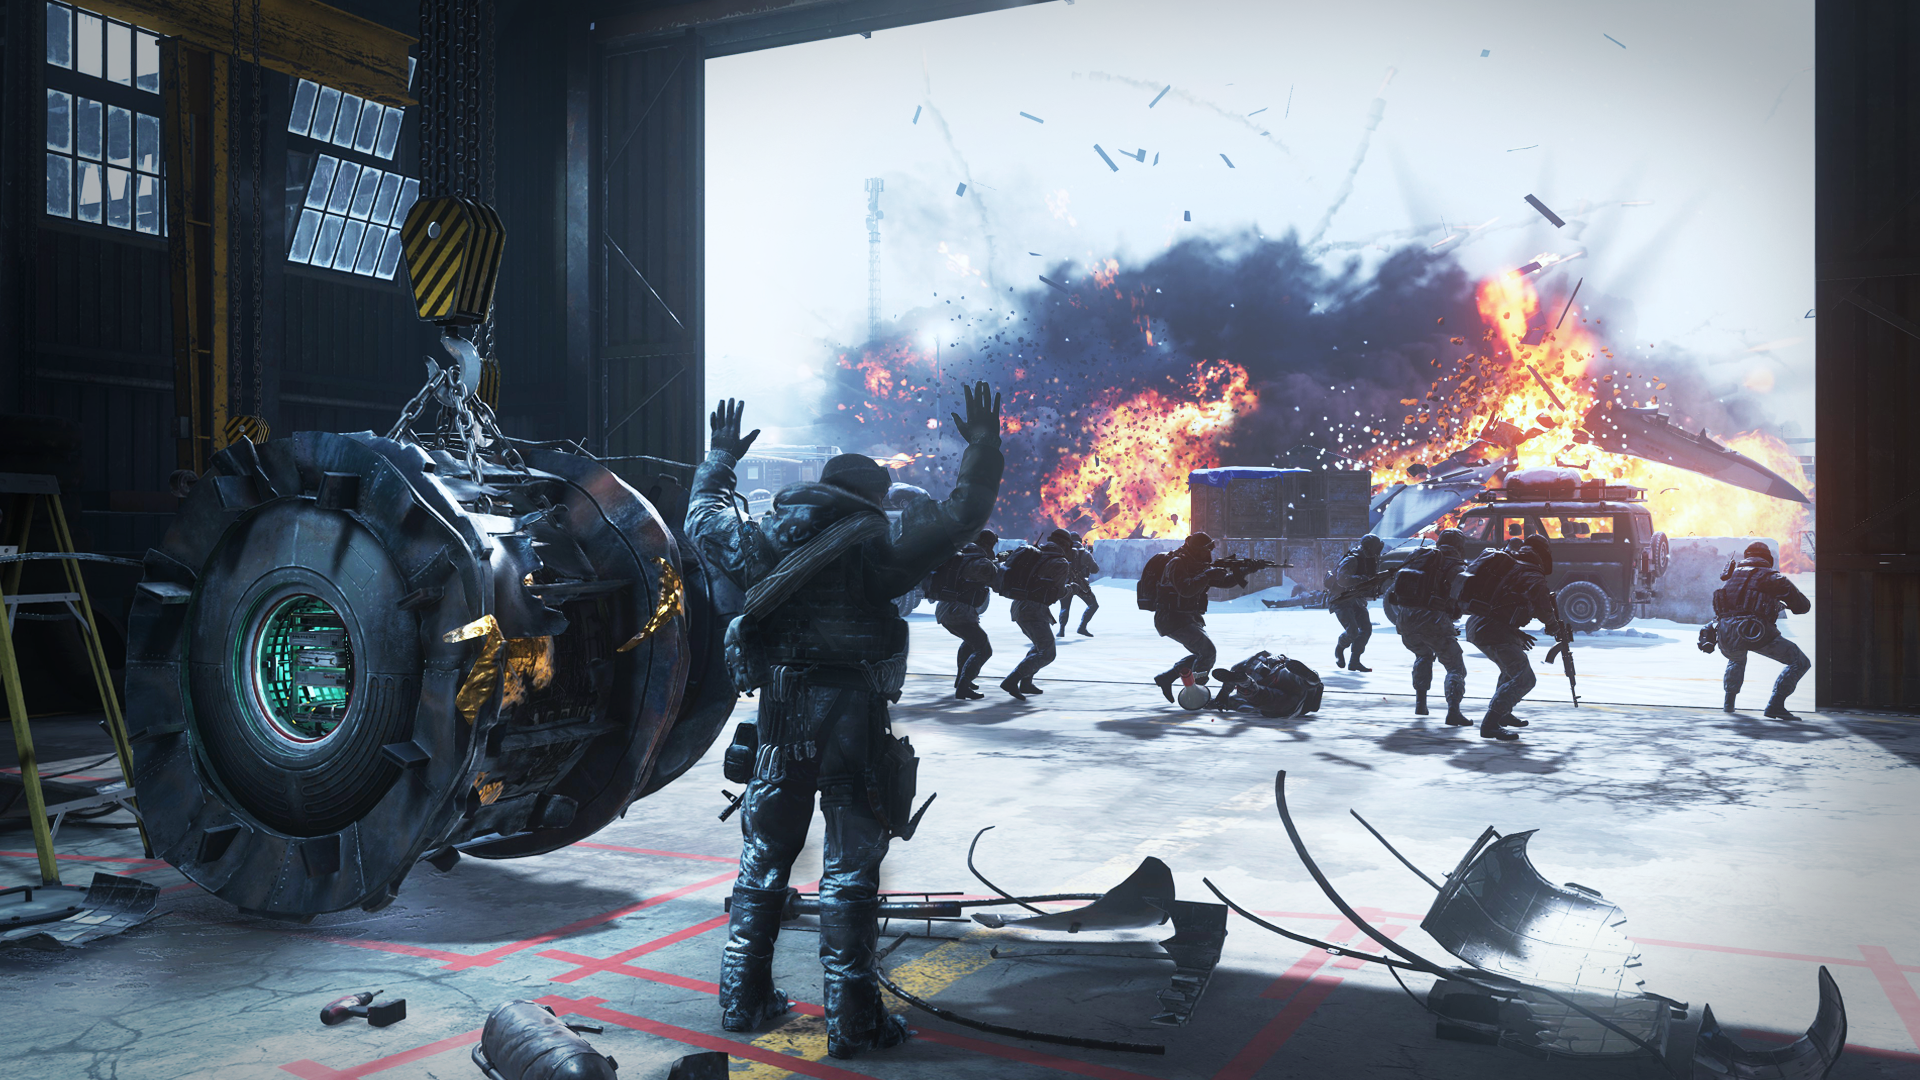 Cliffhanger Mission Call Of Duty Wiki Fandom